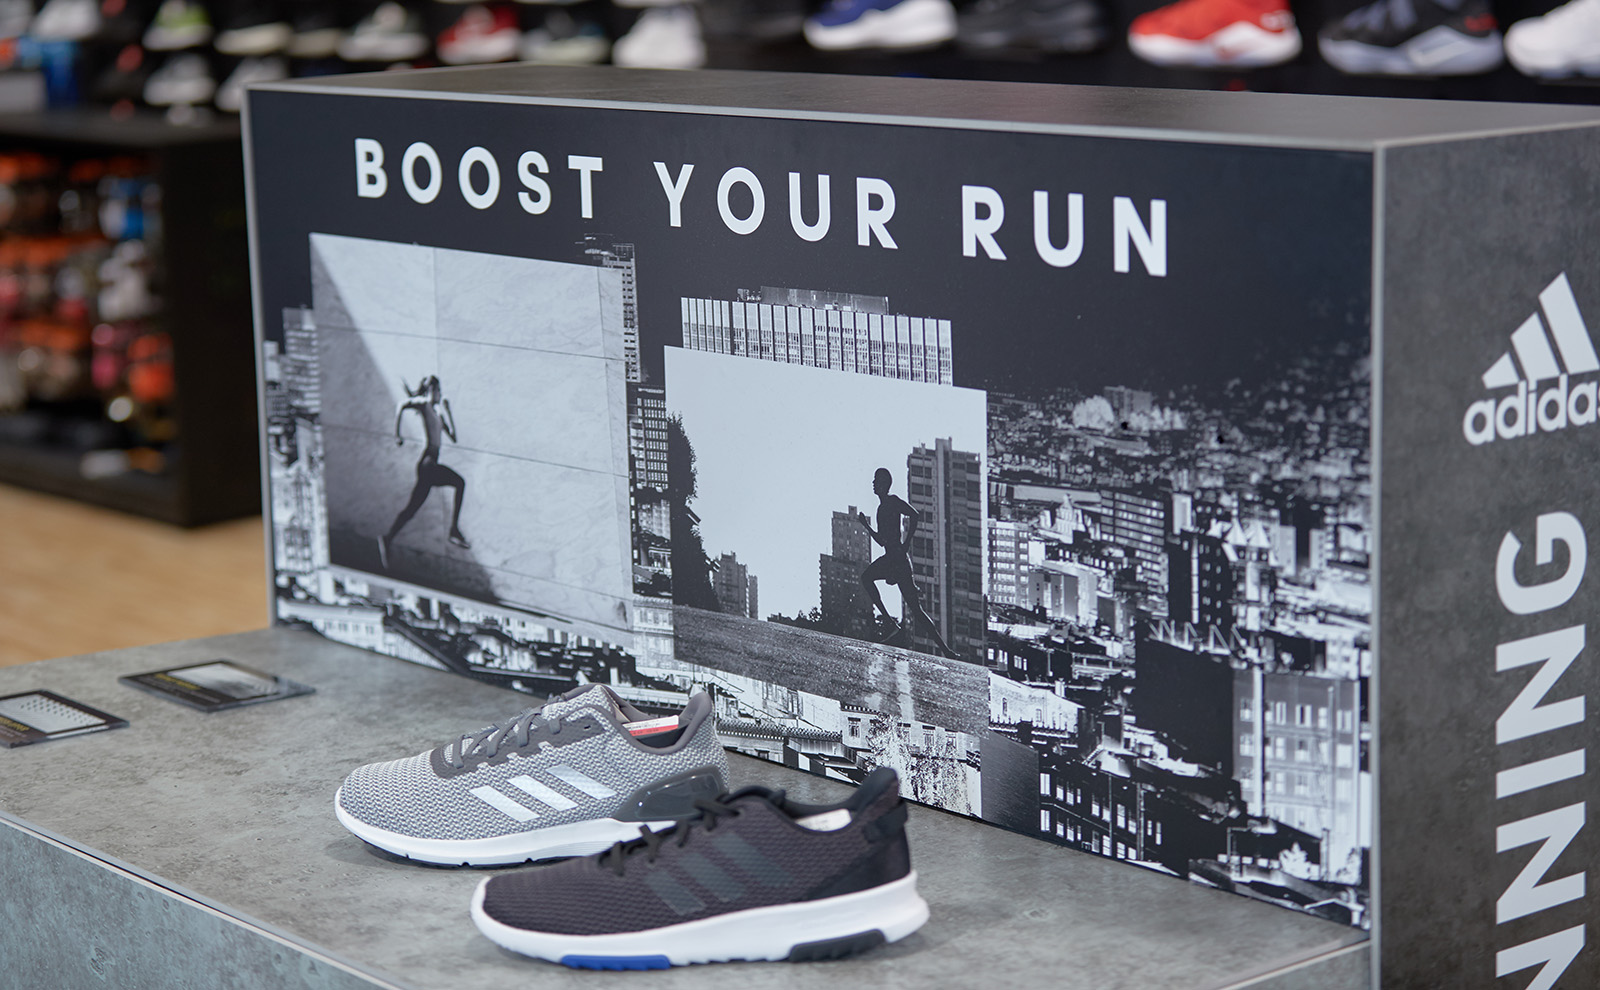 A closer look at an adidas custom shoe display